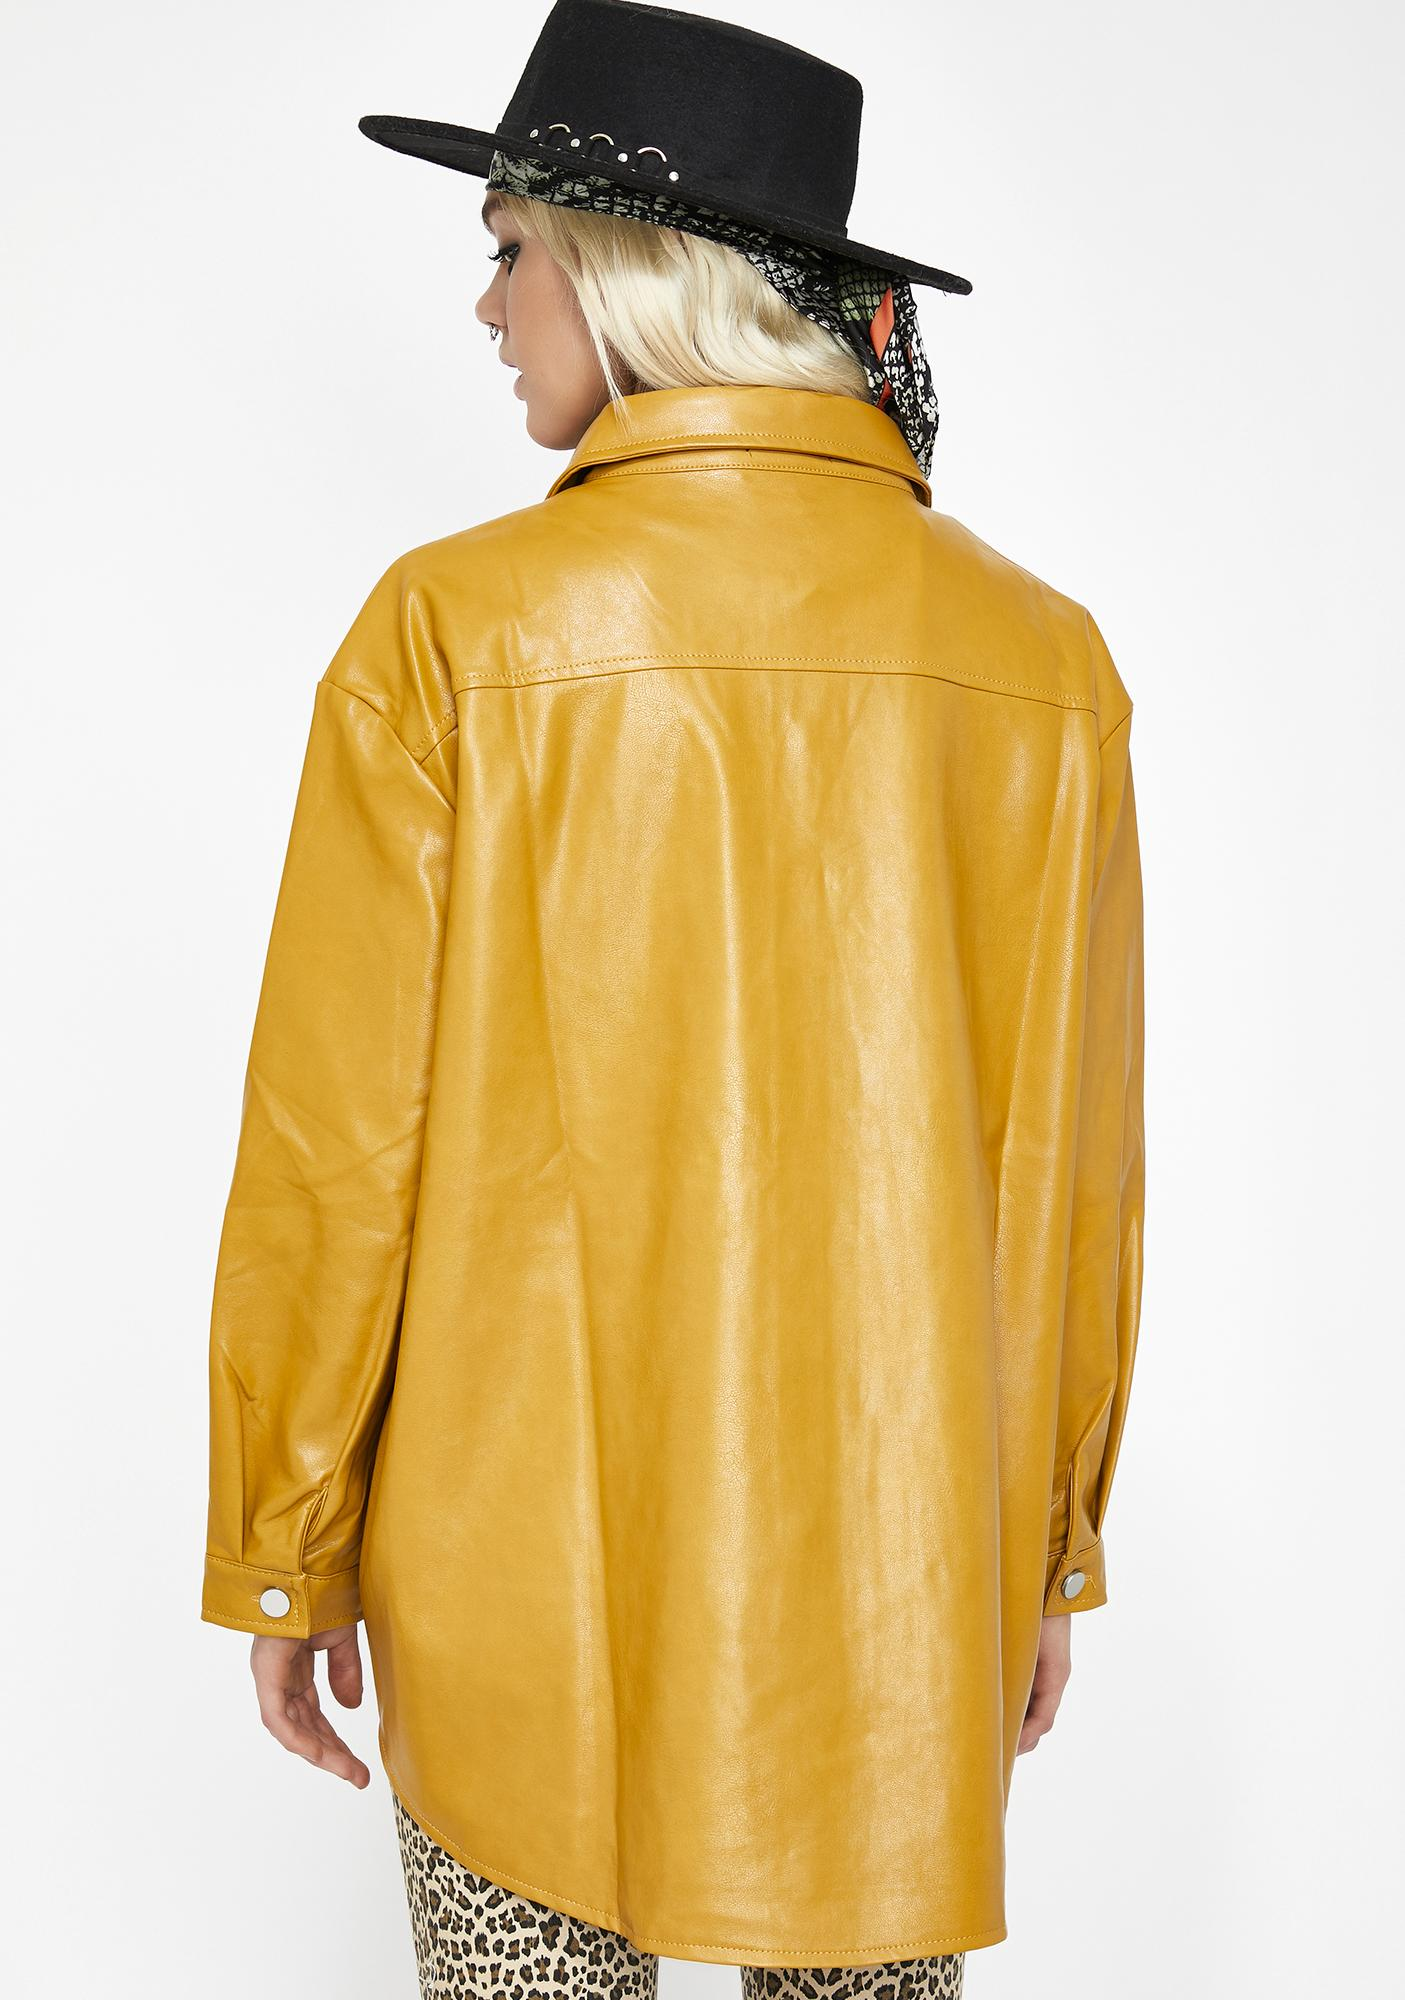 Silent Killa Leather Shirt